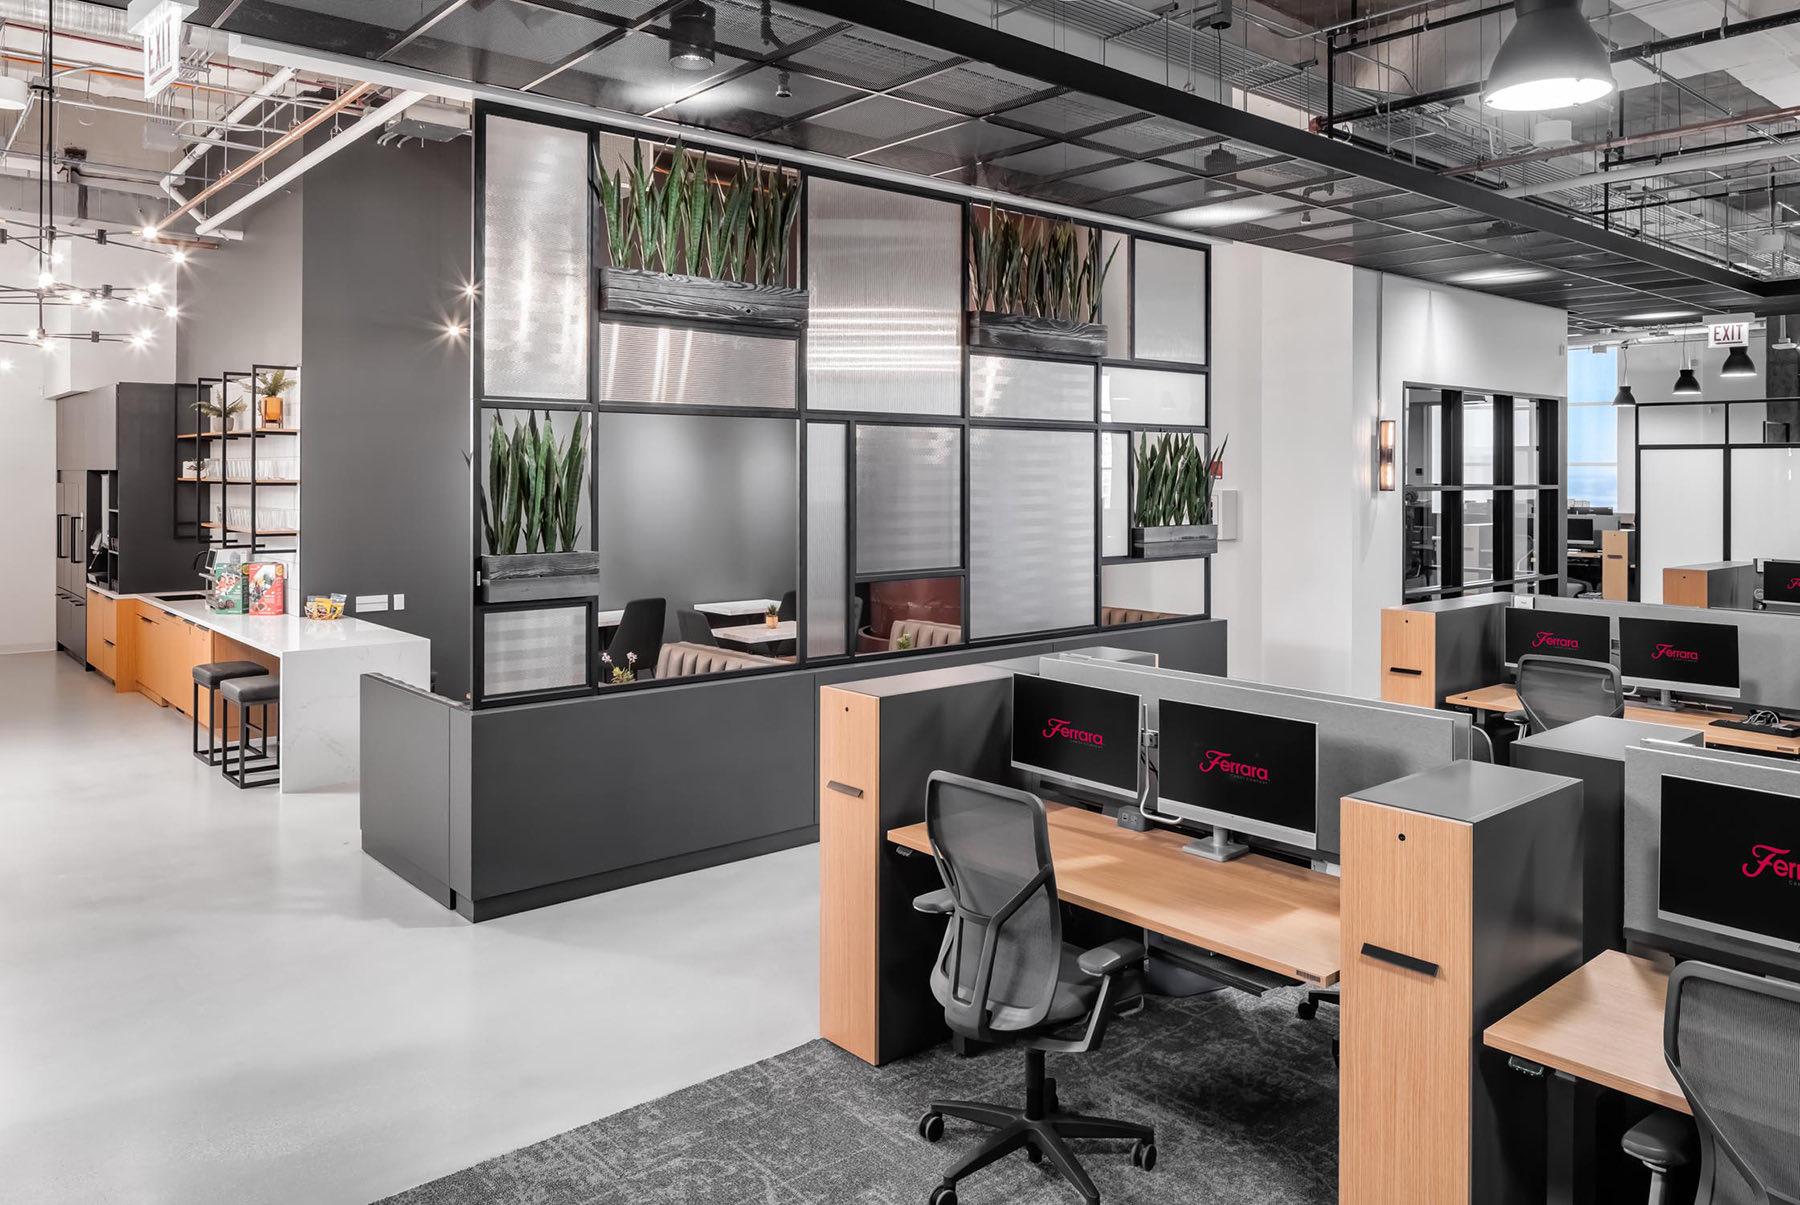 ferrara-candy-chicago-office-9